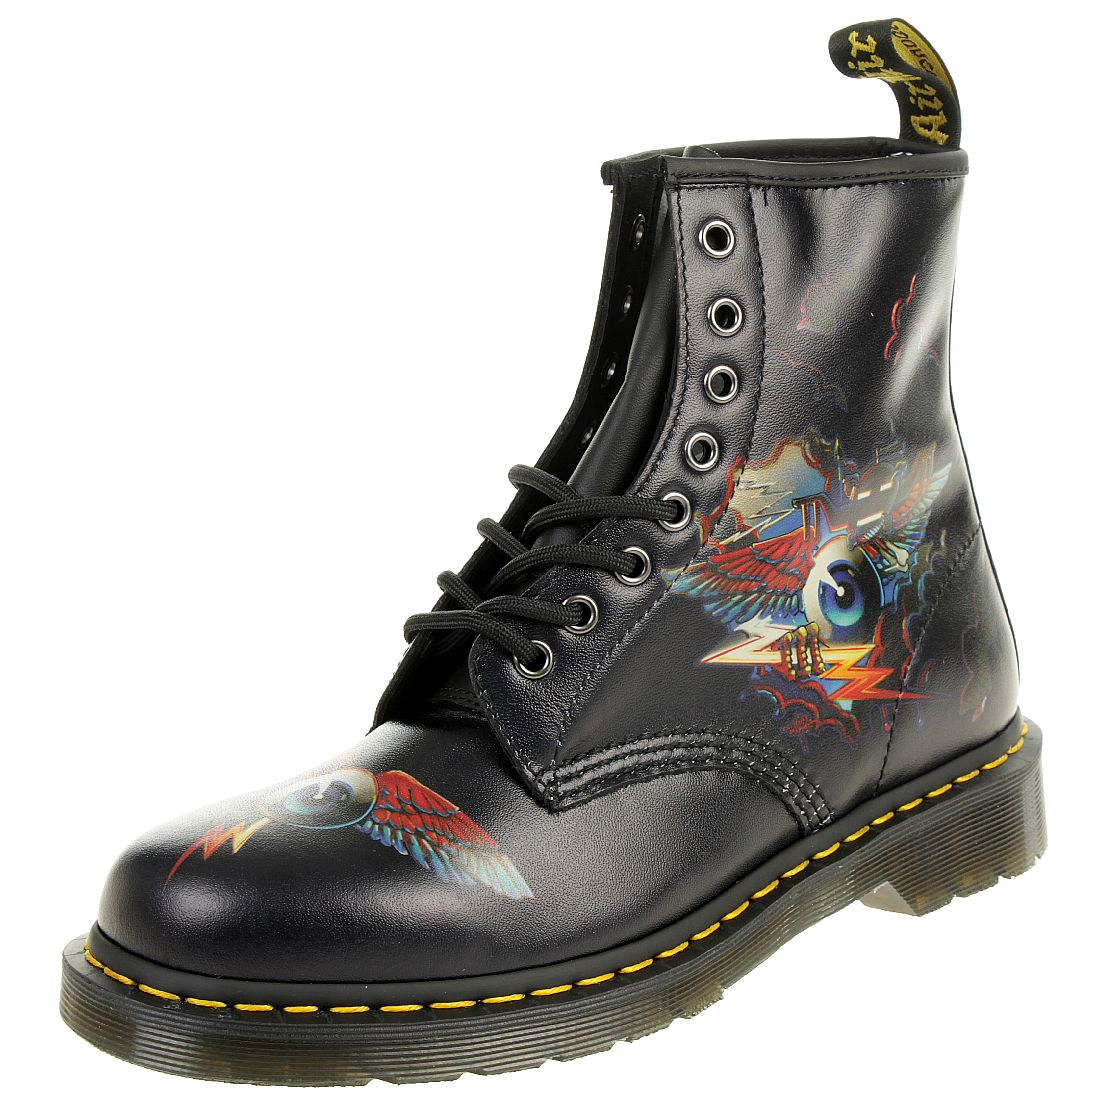 c3fe6542b519d0 Dr. Martens 1460 RG Eye Backhand Black Unisex Stiefel Boots Rick Griffin  schwarz